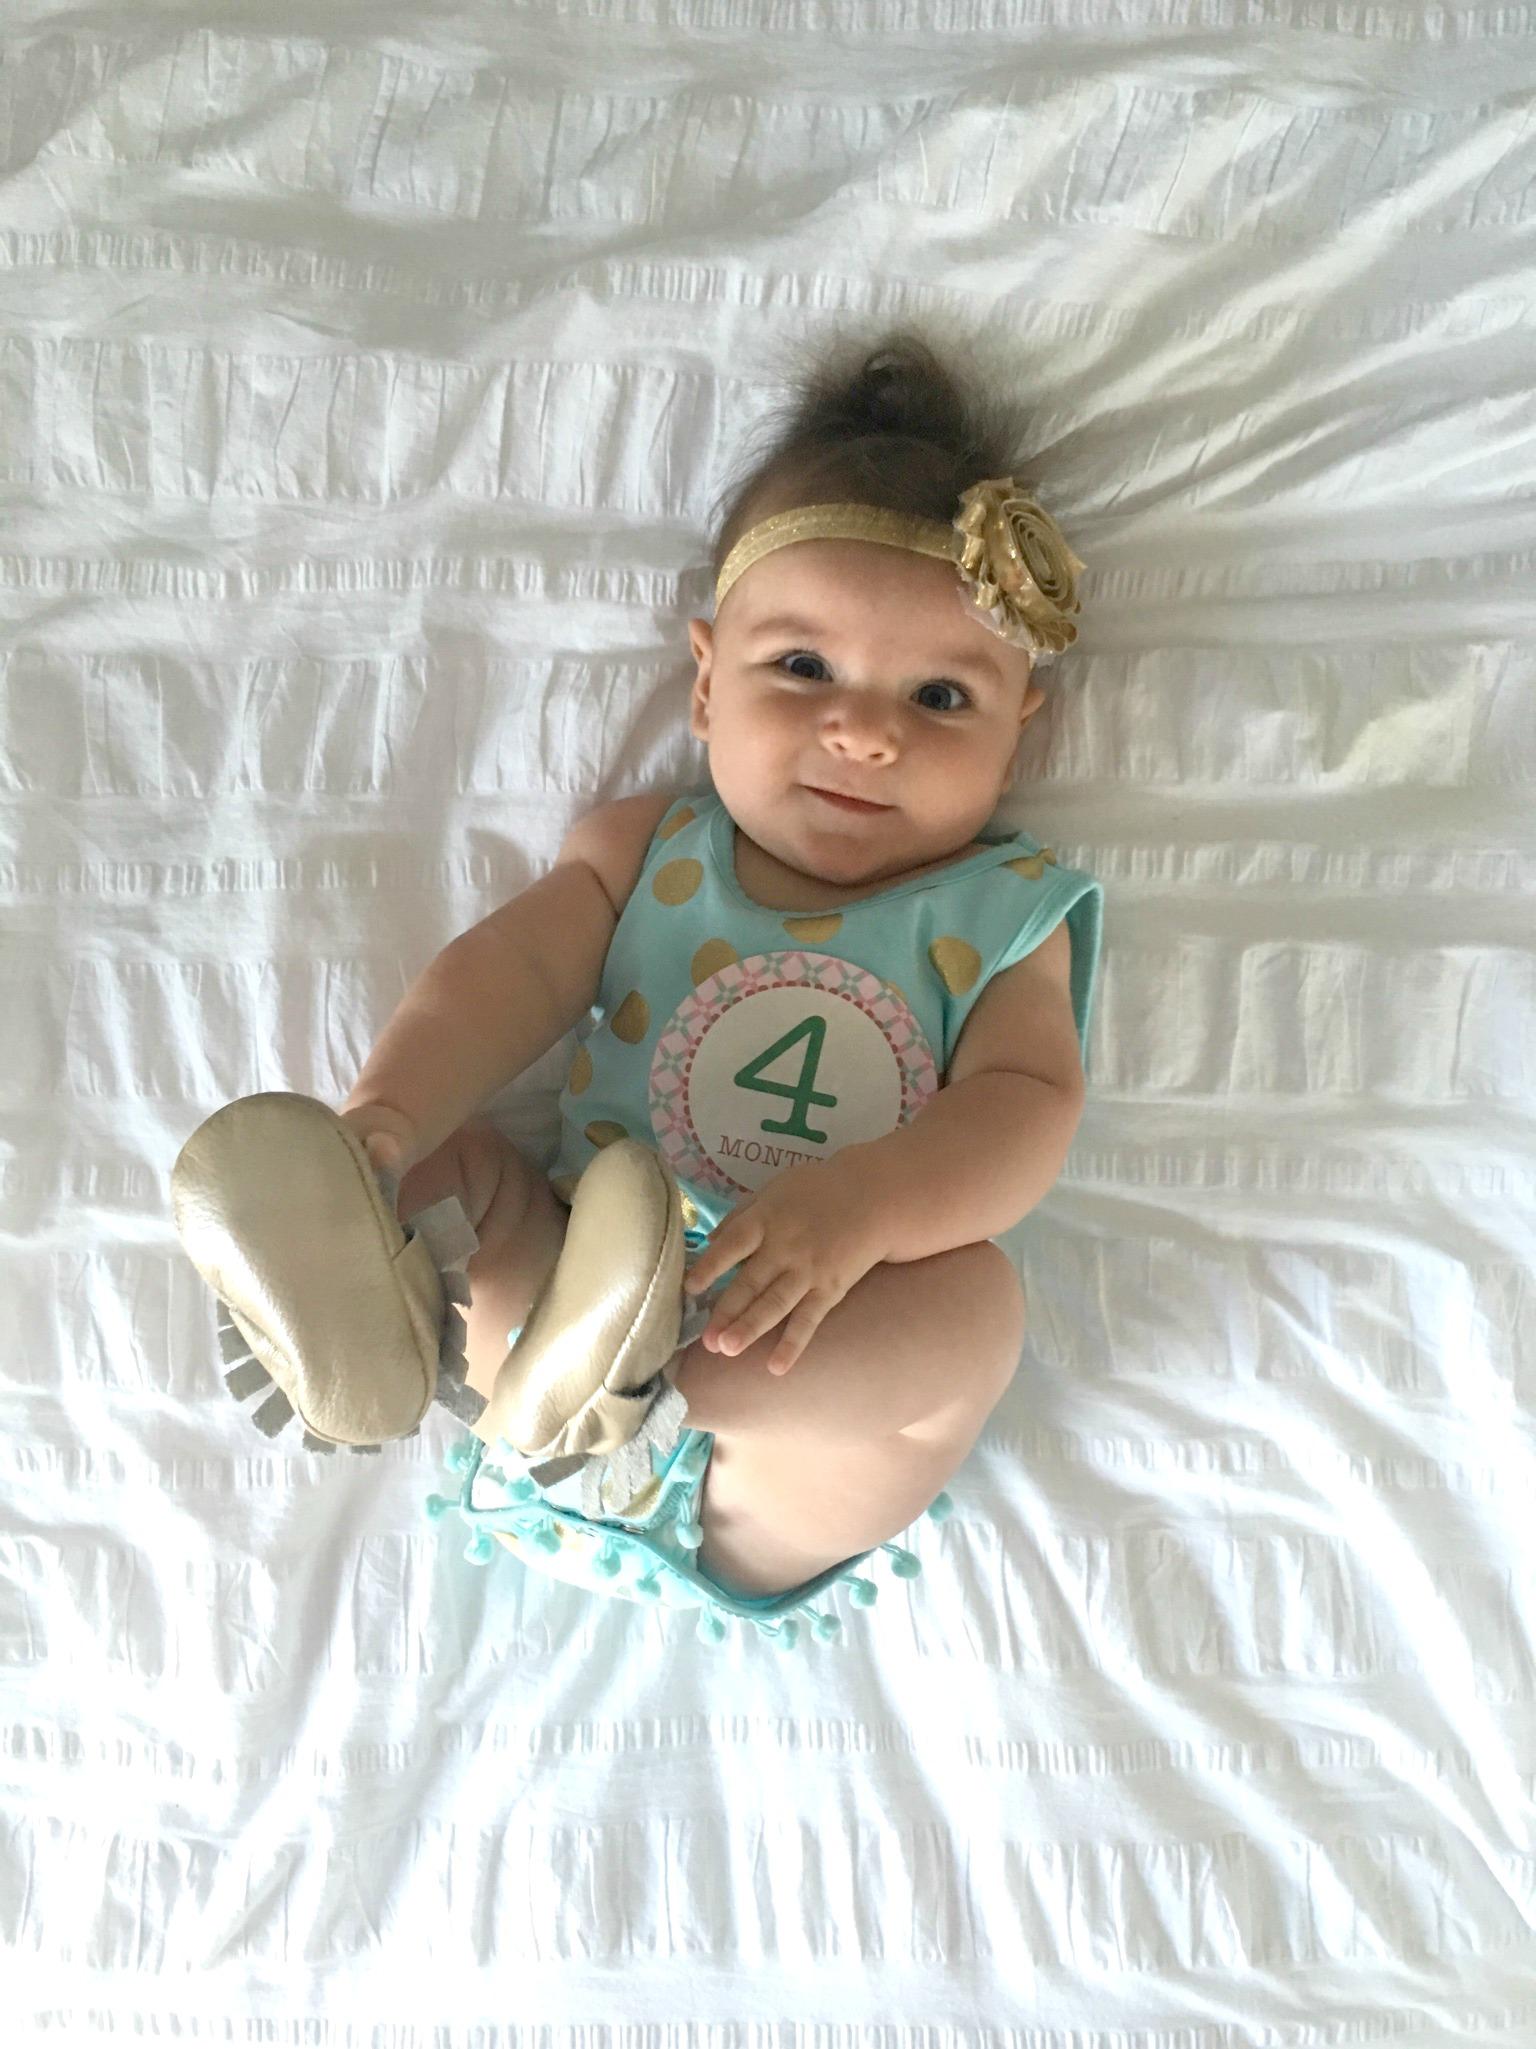 delaney 4 months